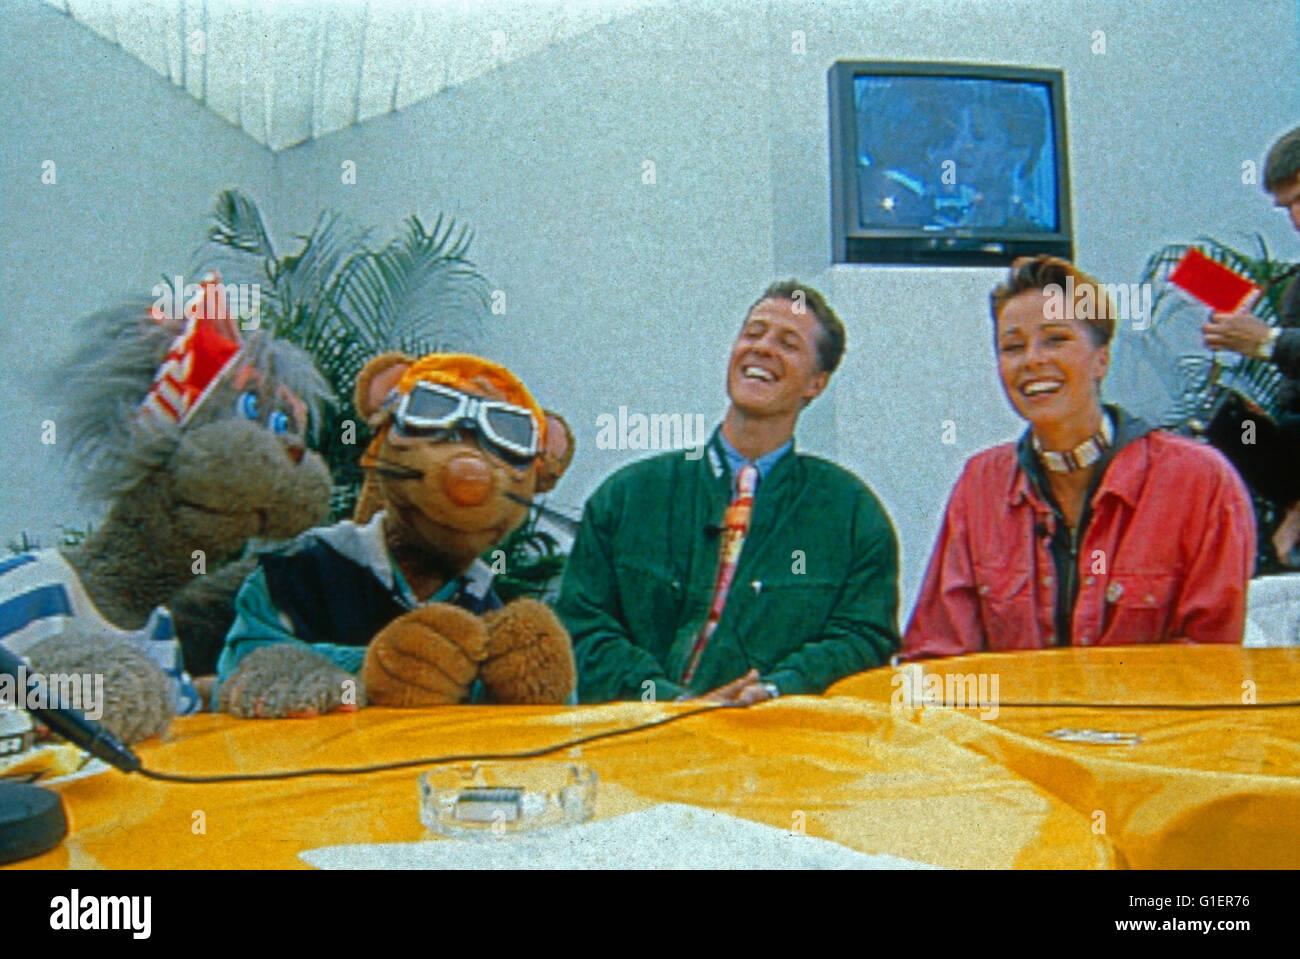 Bim Bam Microscópios binoculares, Kinderfernsehserie, Deutschland 1988 - 1998, Maus Microscópios binoculares, Imagens de Stock